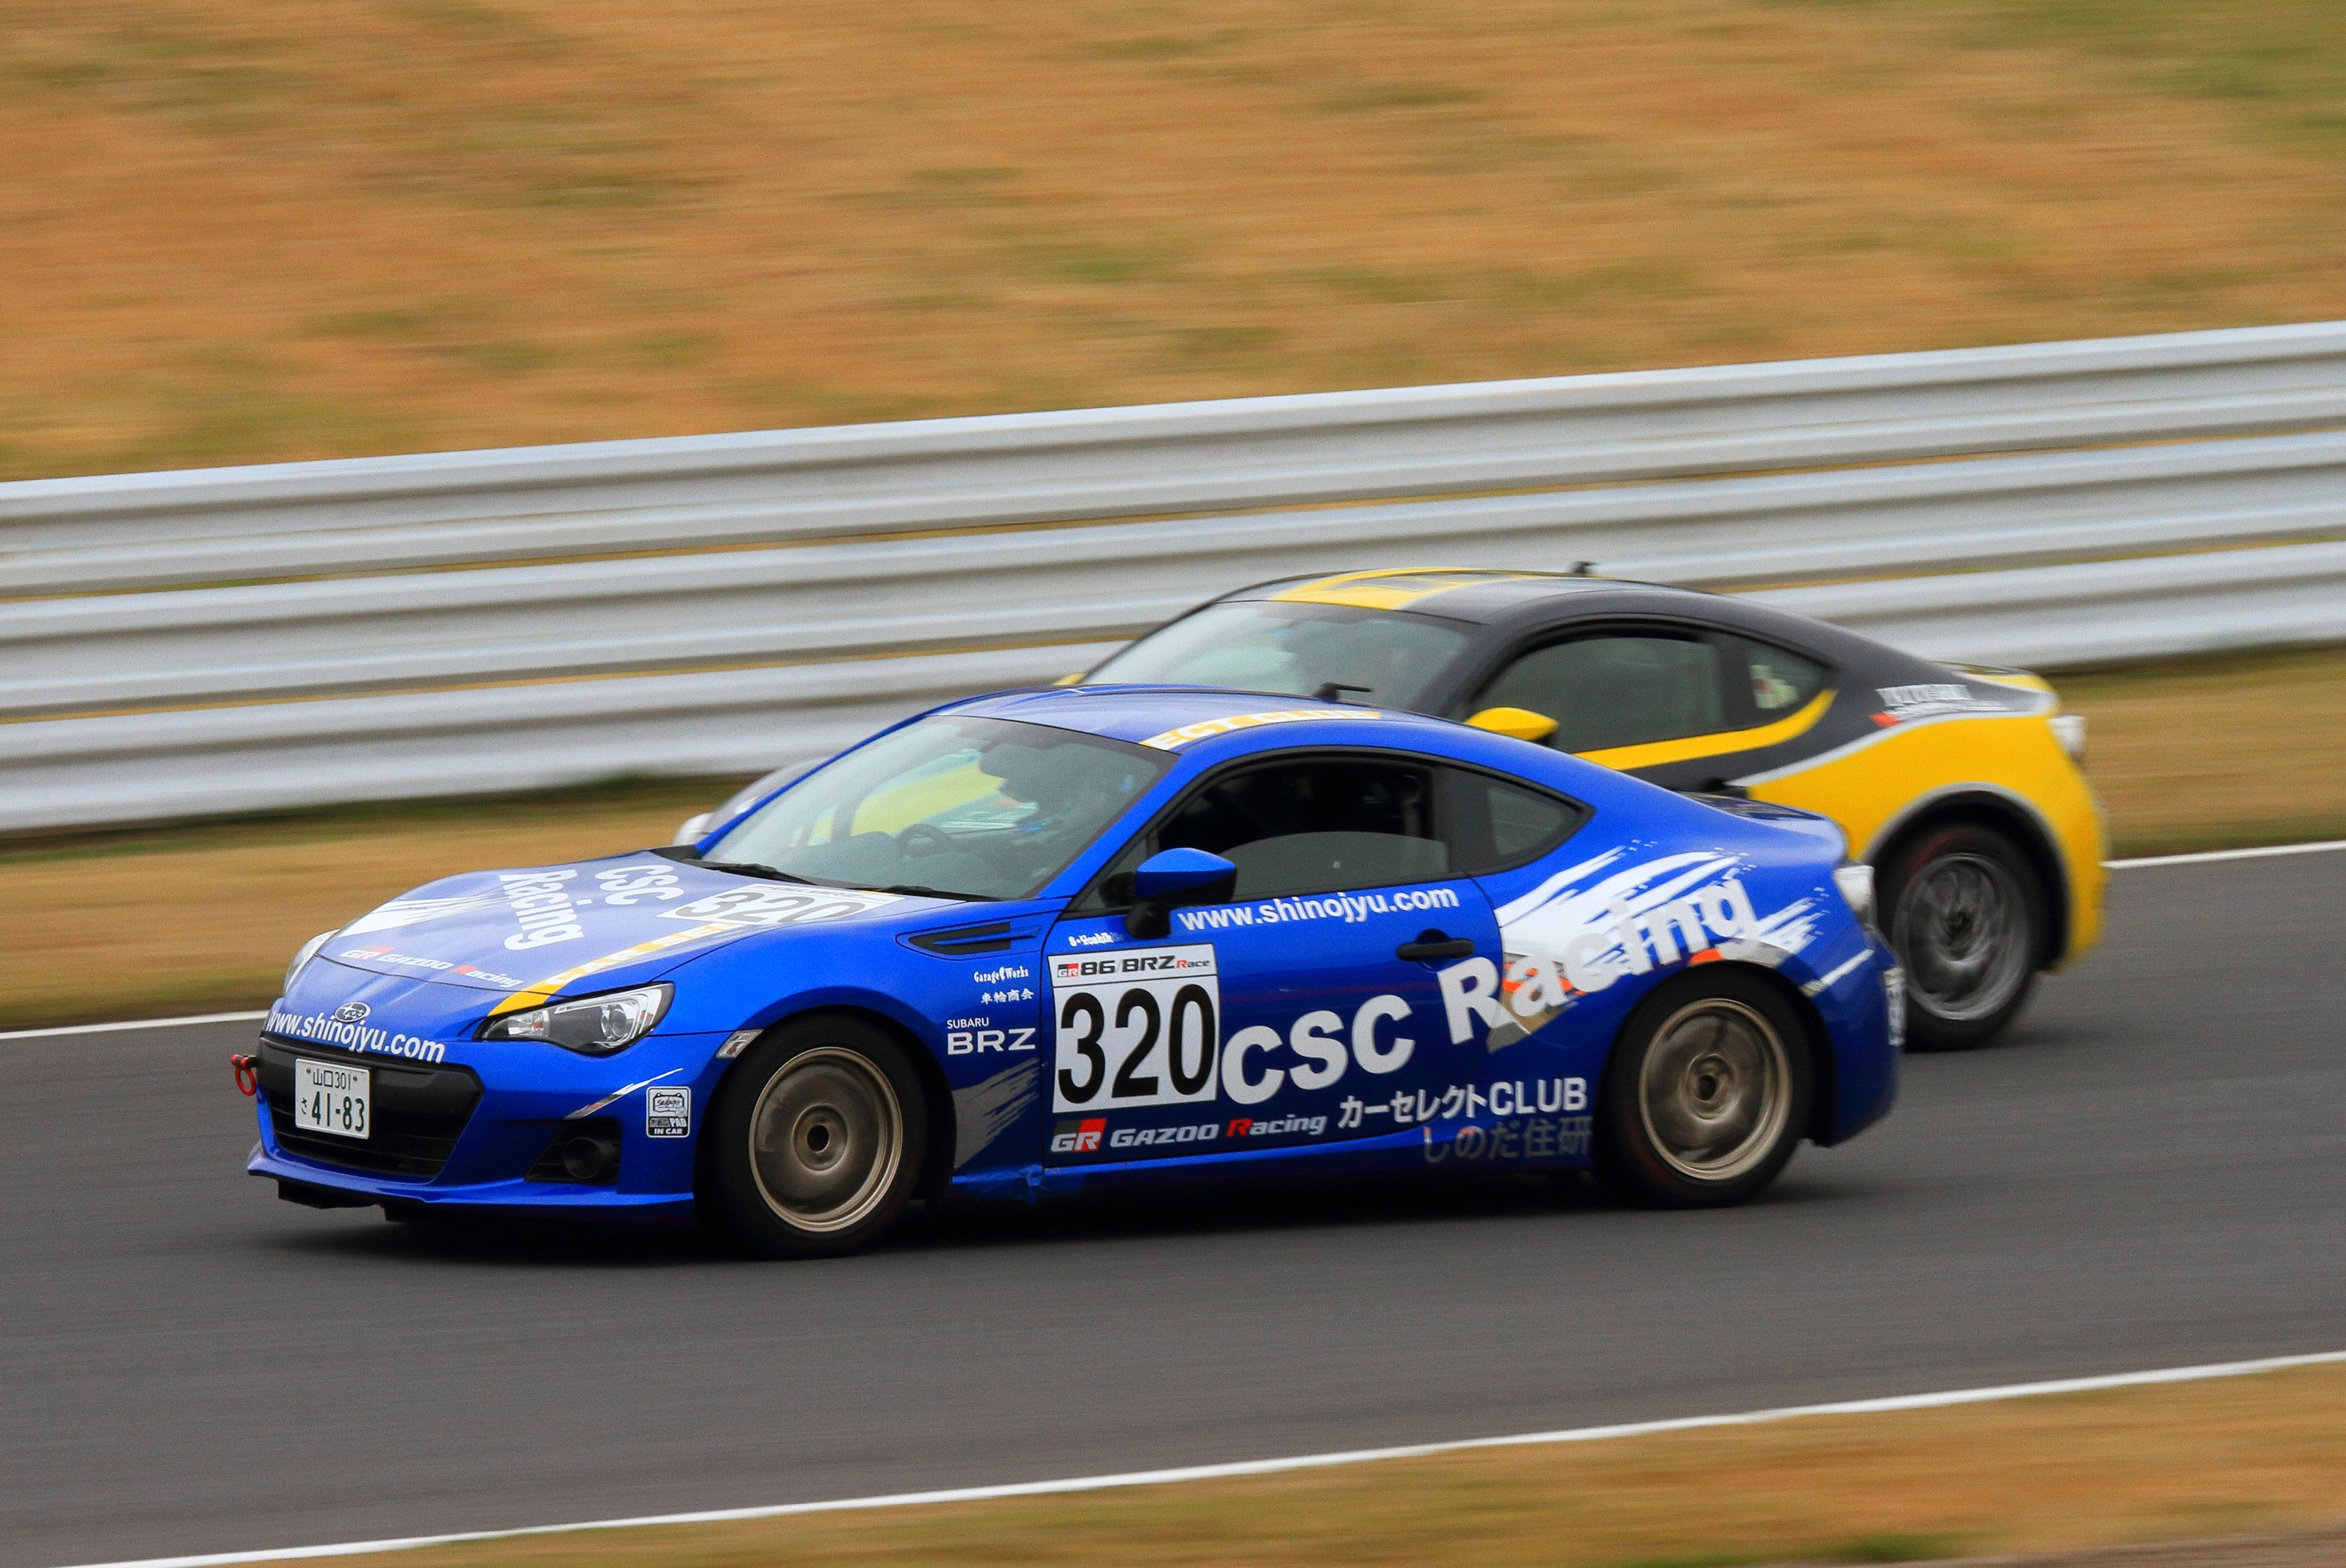 racecar, speed, no people, auto racing, sports race, day, outdoors, motorsport, motor racing track, formula one racing